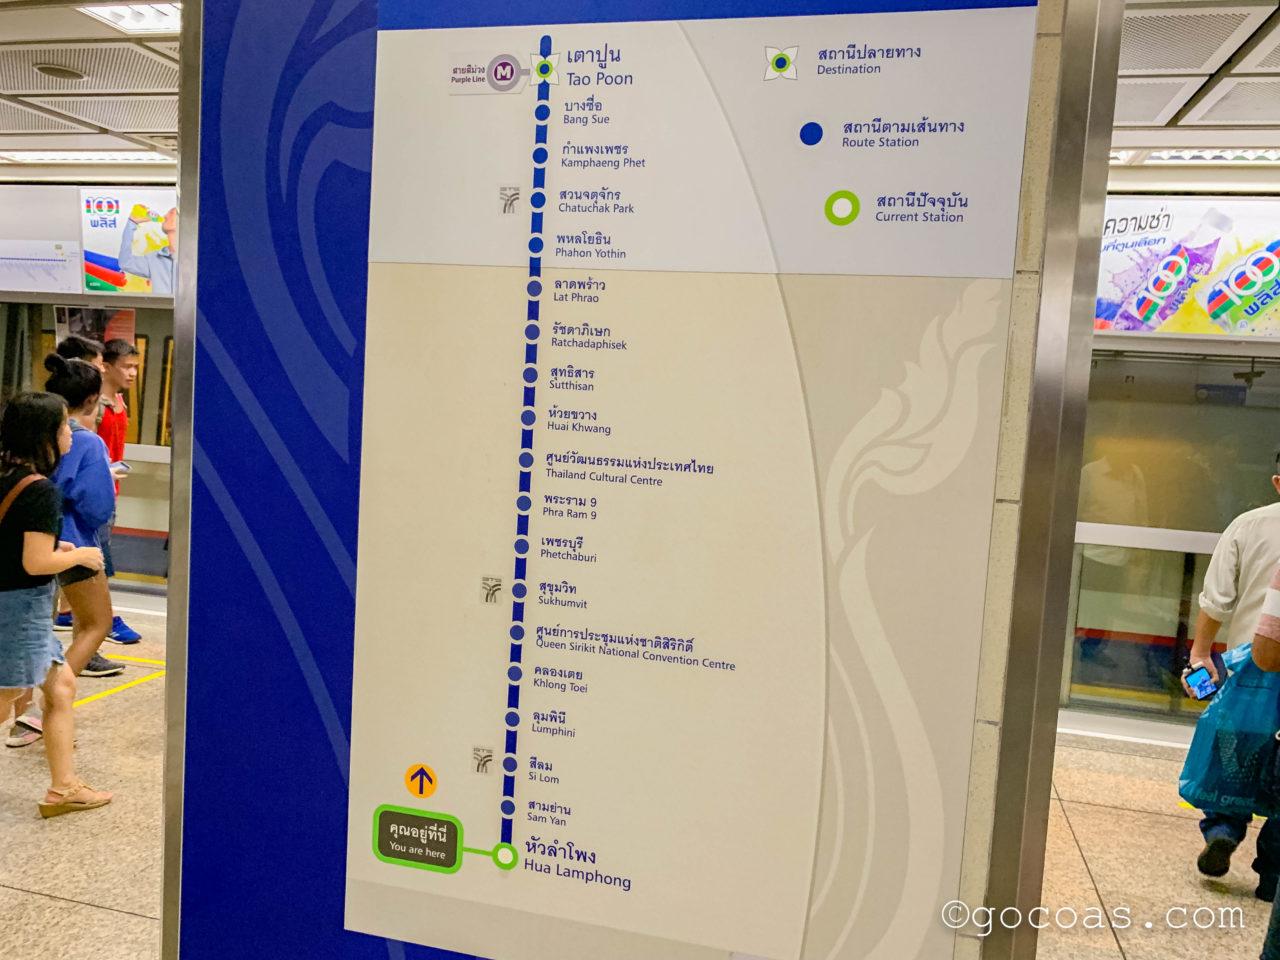 Hua Lamphong駅で購入した地下鉄の路線図